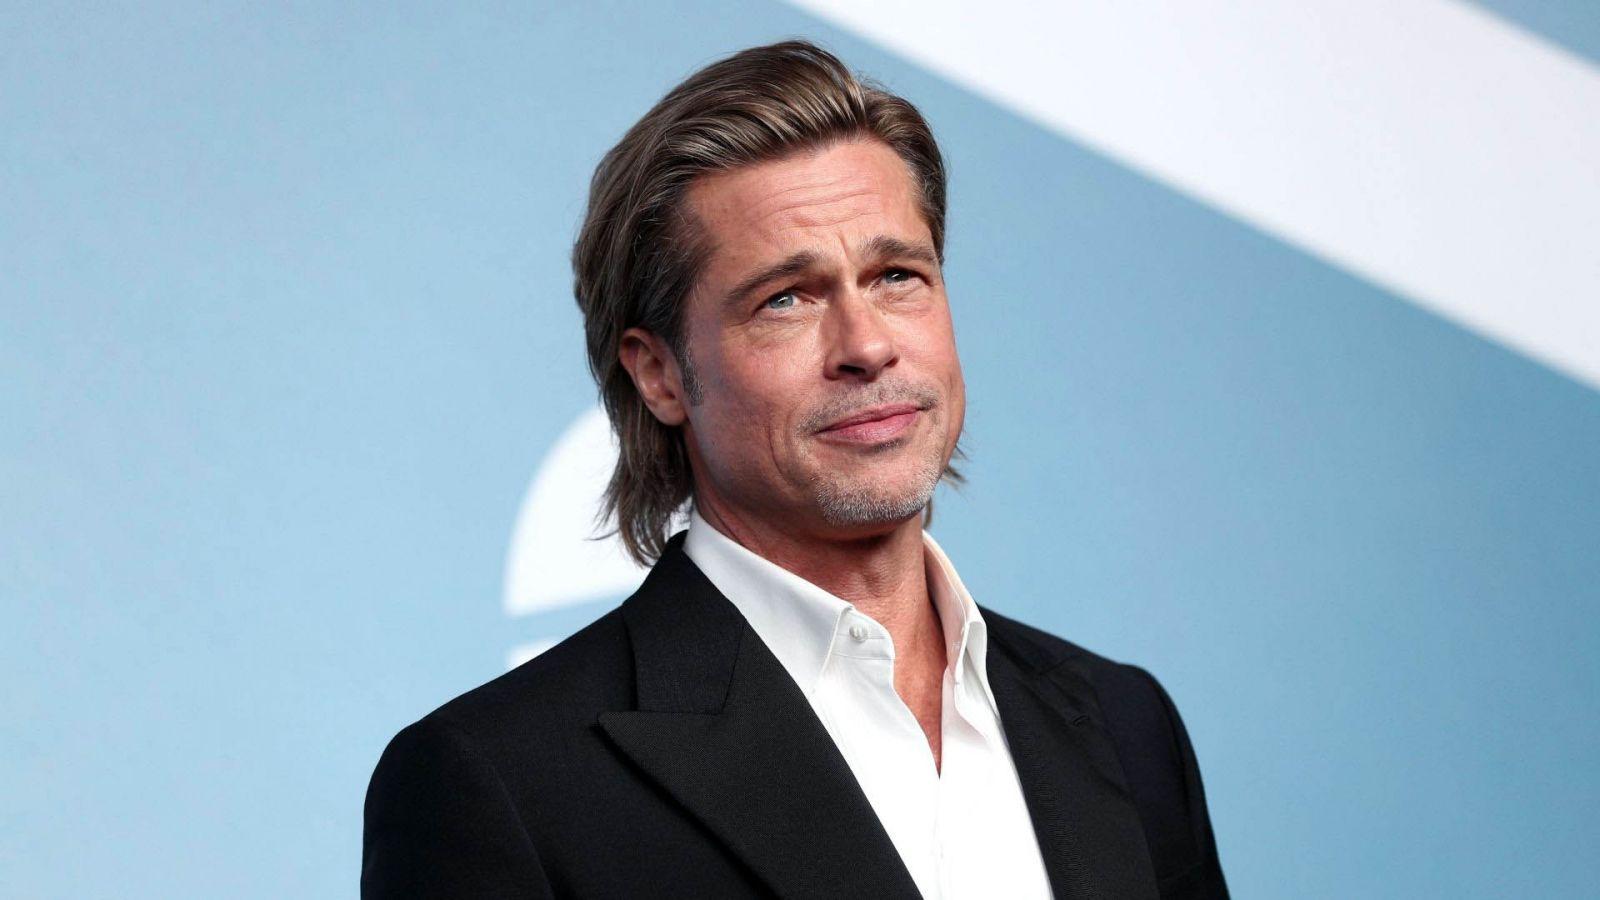 Brad Pitt: Δείτε την καινούρια σύντροφο του [pics]